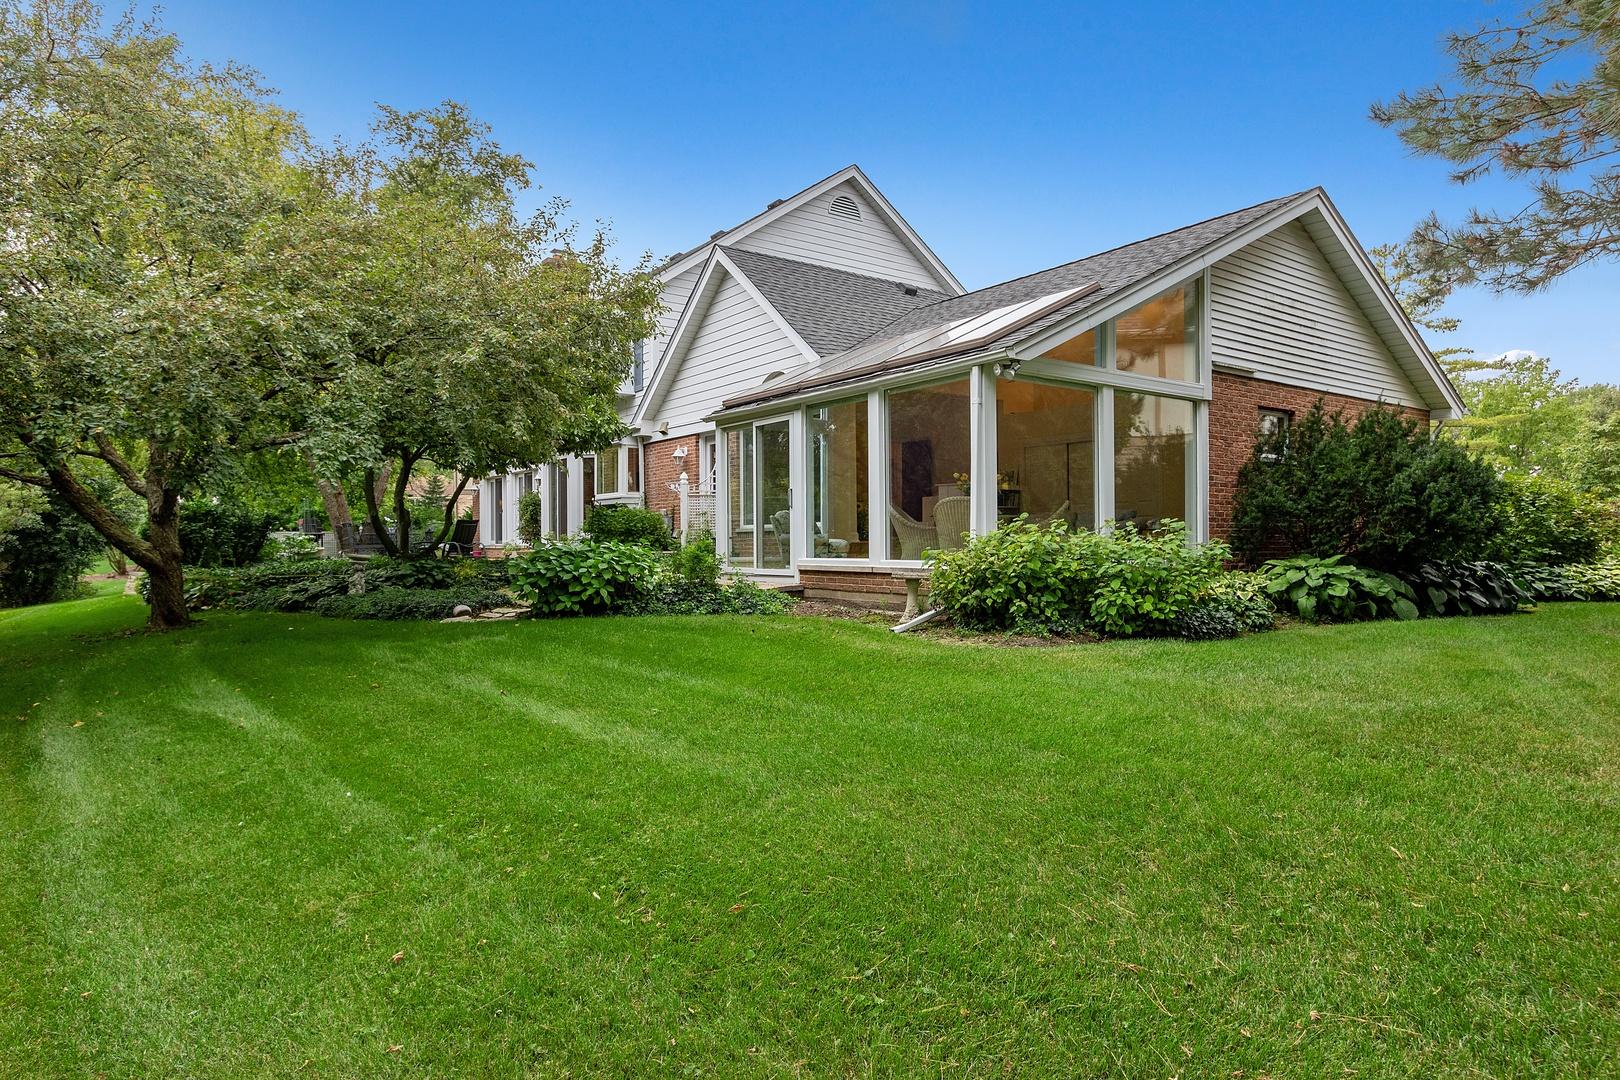 361 South Harrison, Palatine, Illinois, 60067